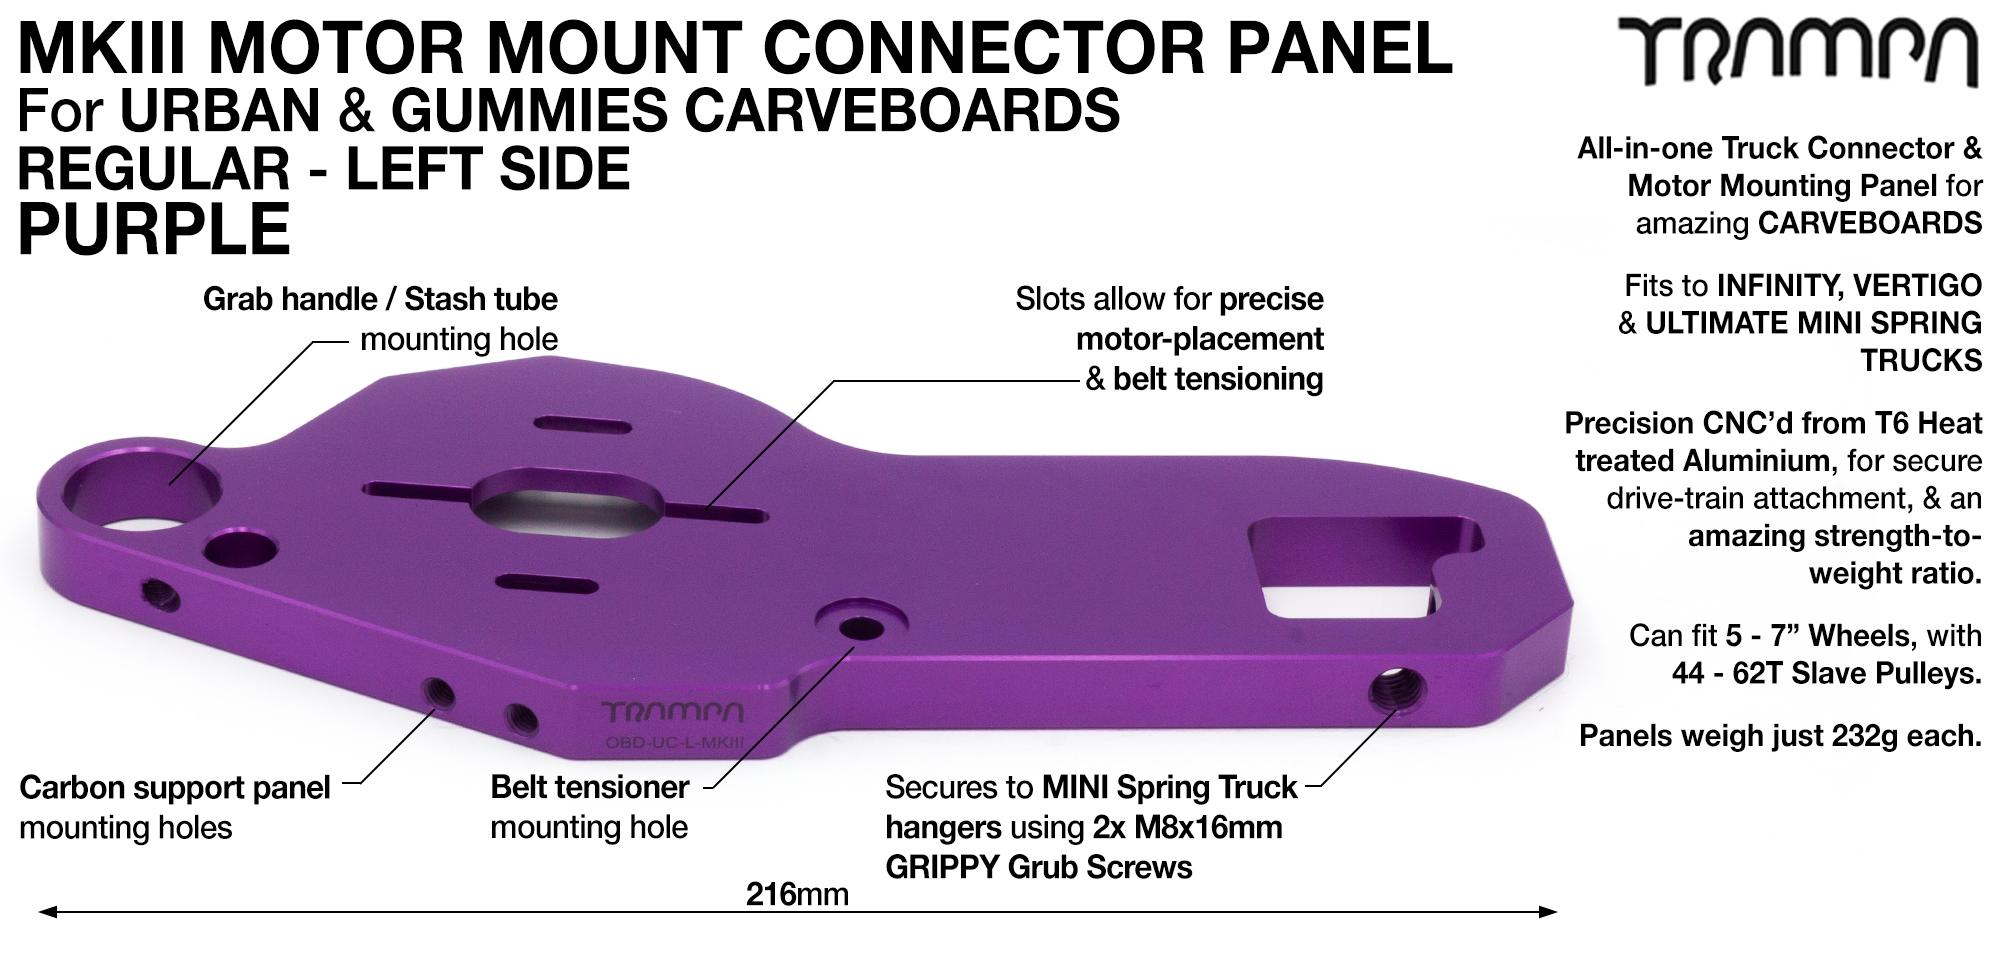 MkIII CARVE Truck Motor Mount T6 Aluminium Anodised - REGULAR PURPLE